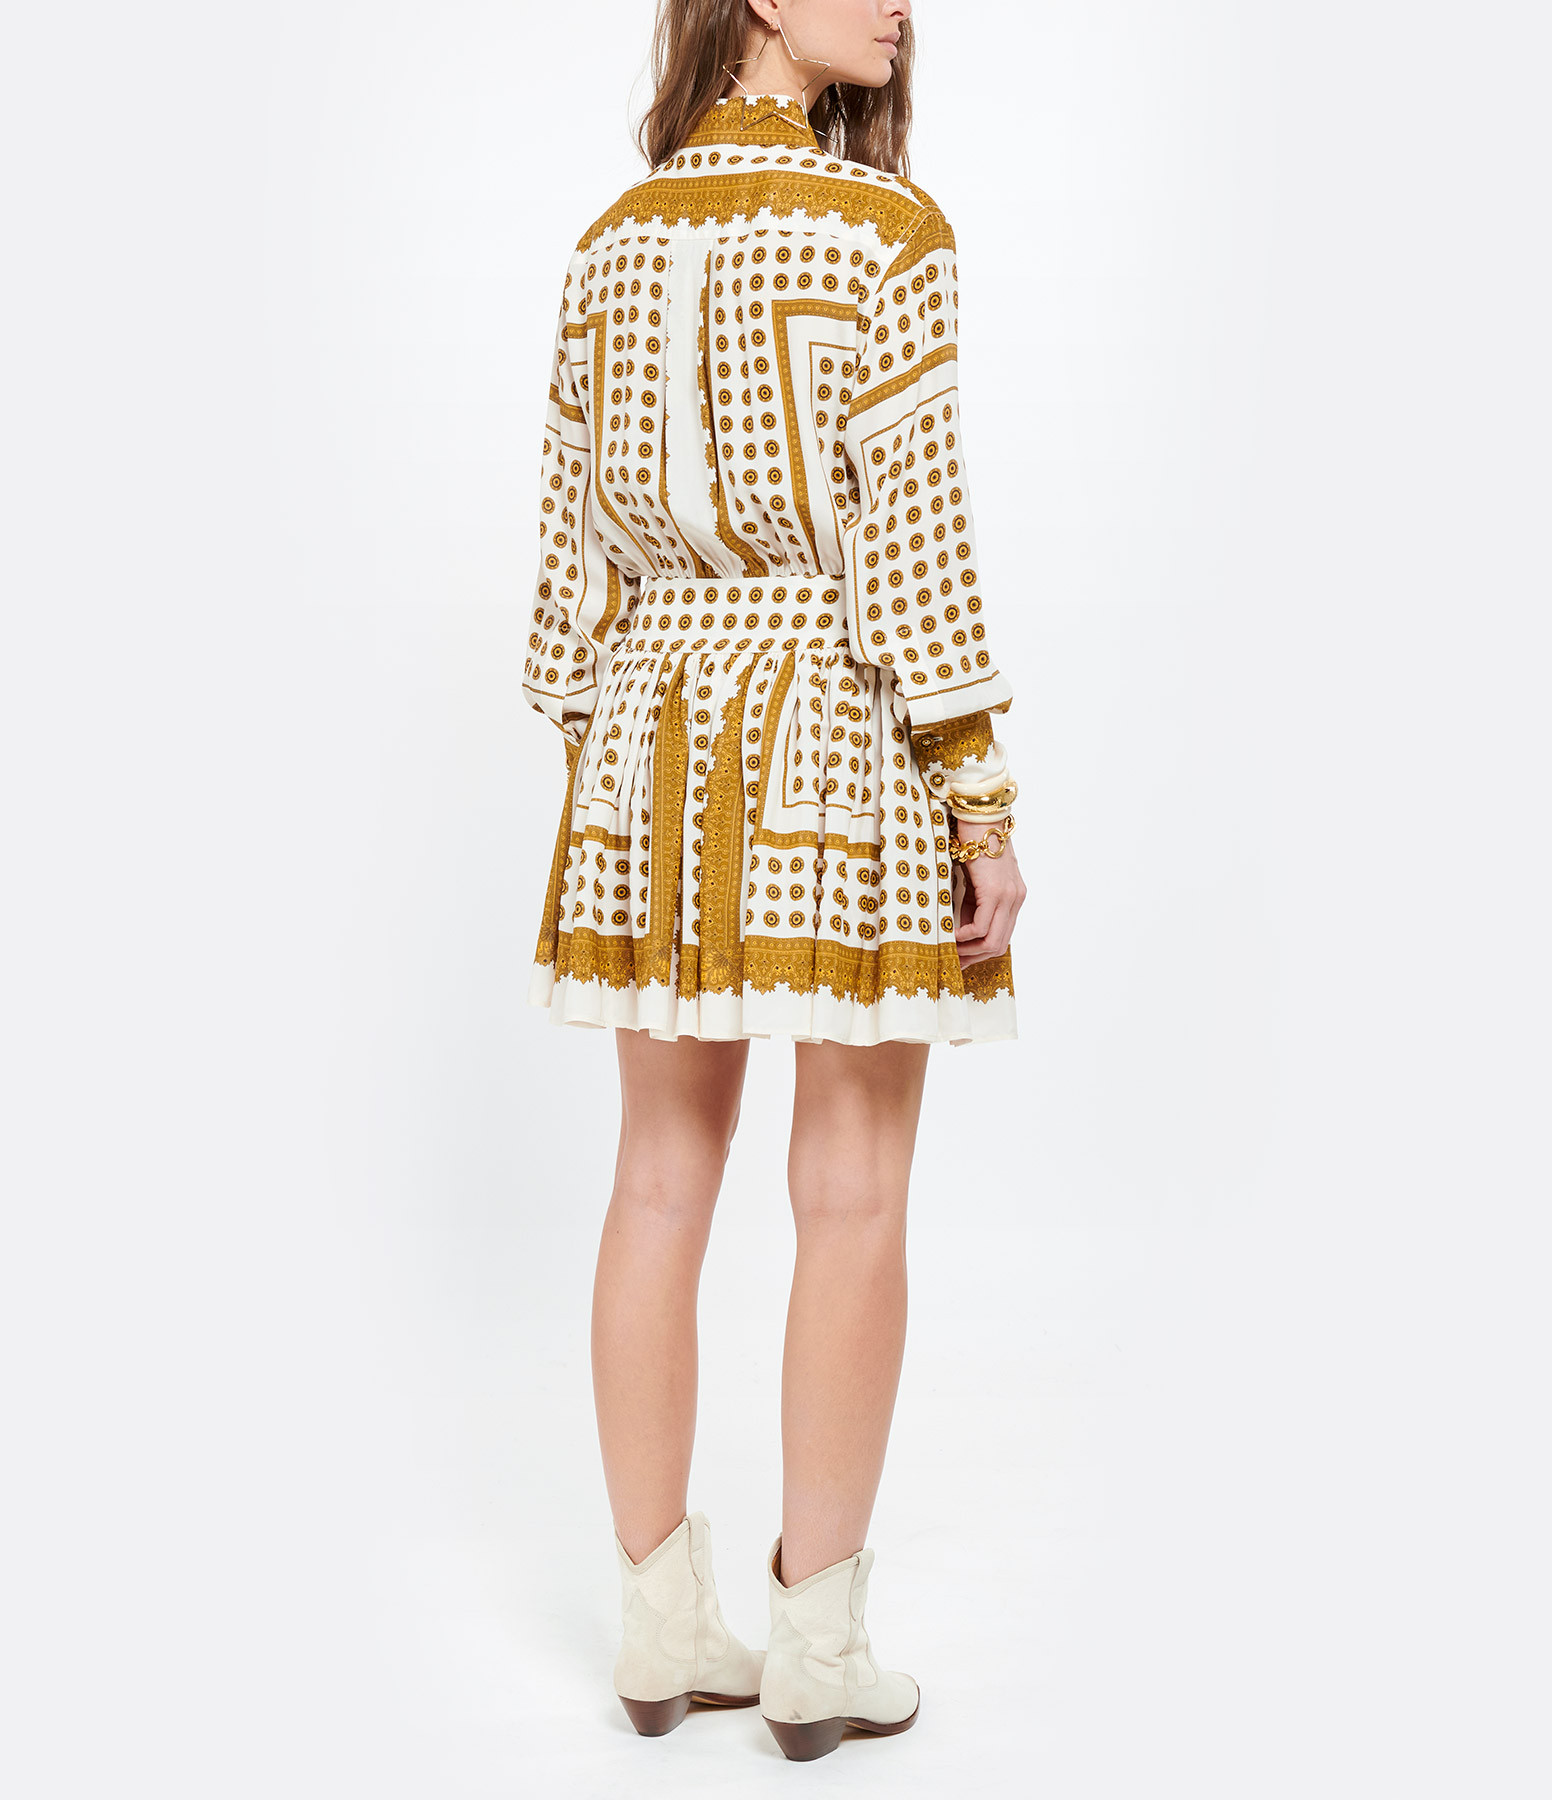 ZIMMERMANN - Robe Mini Pois Marron Imprimé